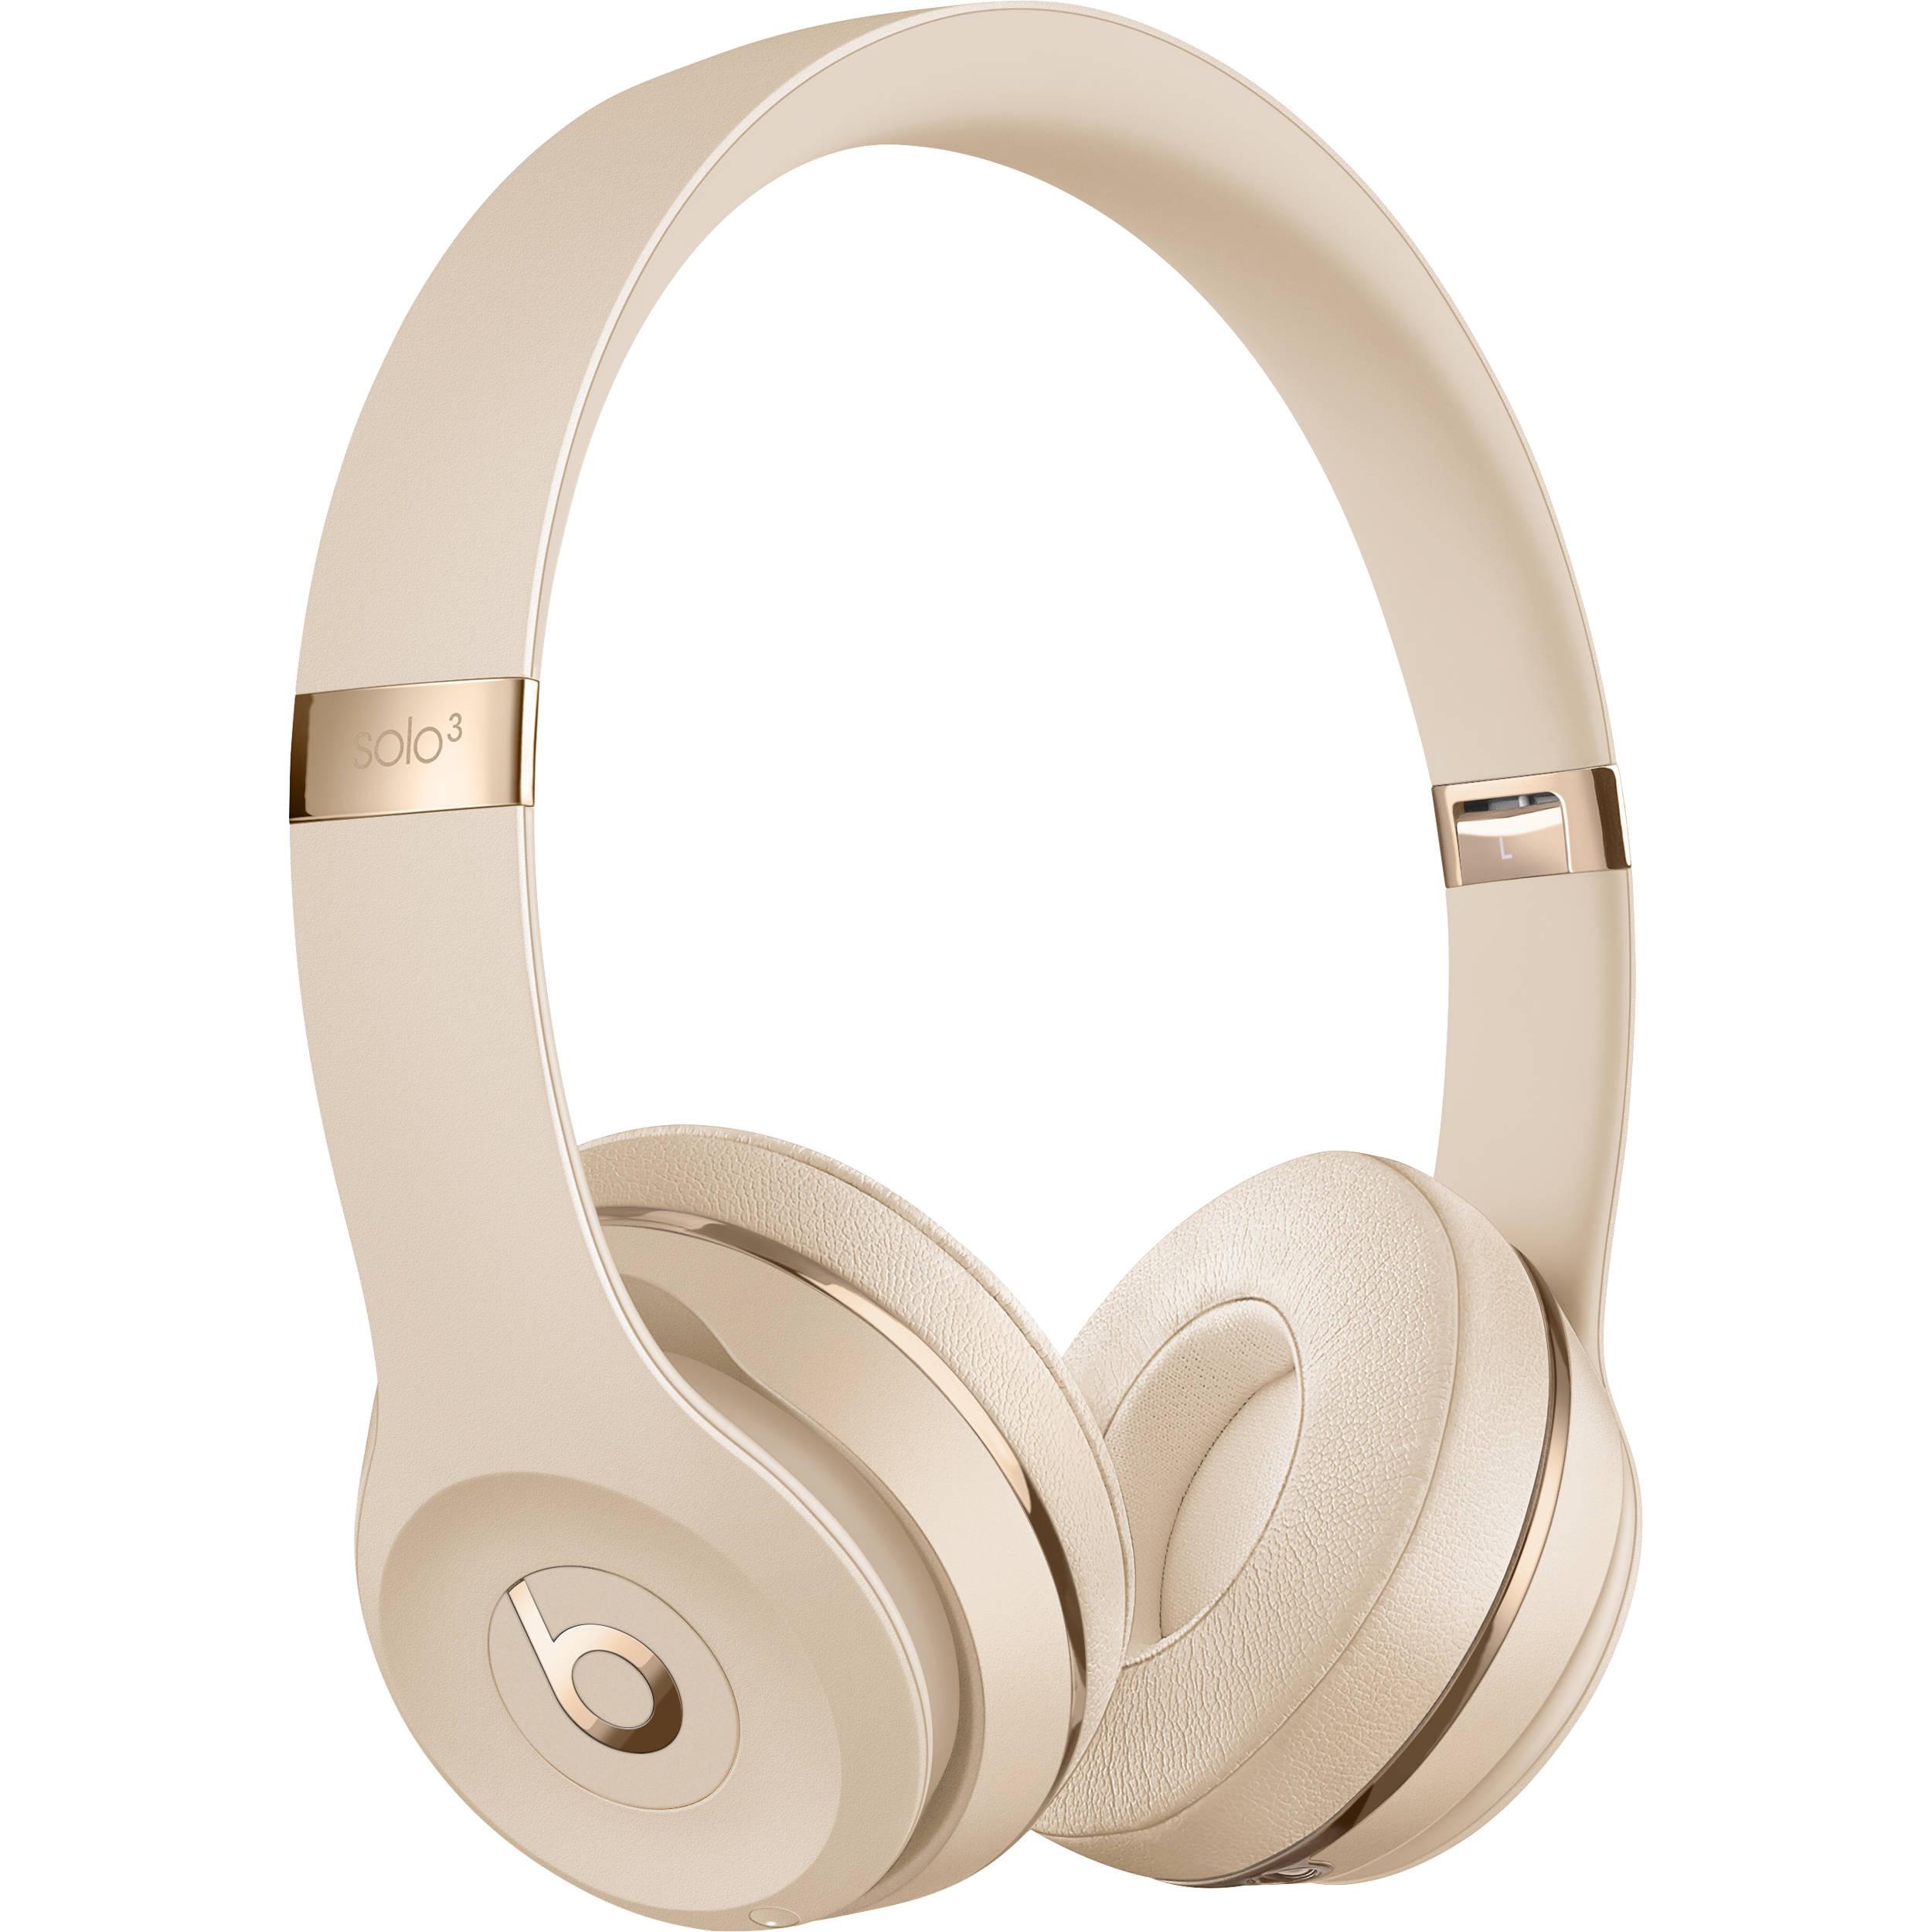 Beats By Dr Dre Solo3 Wireless Headphones Satin Gold Mx462lla